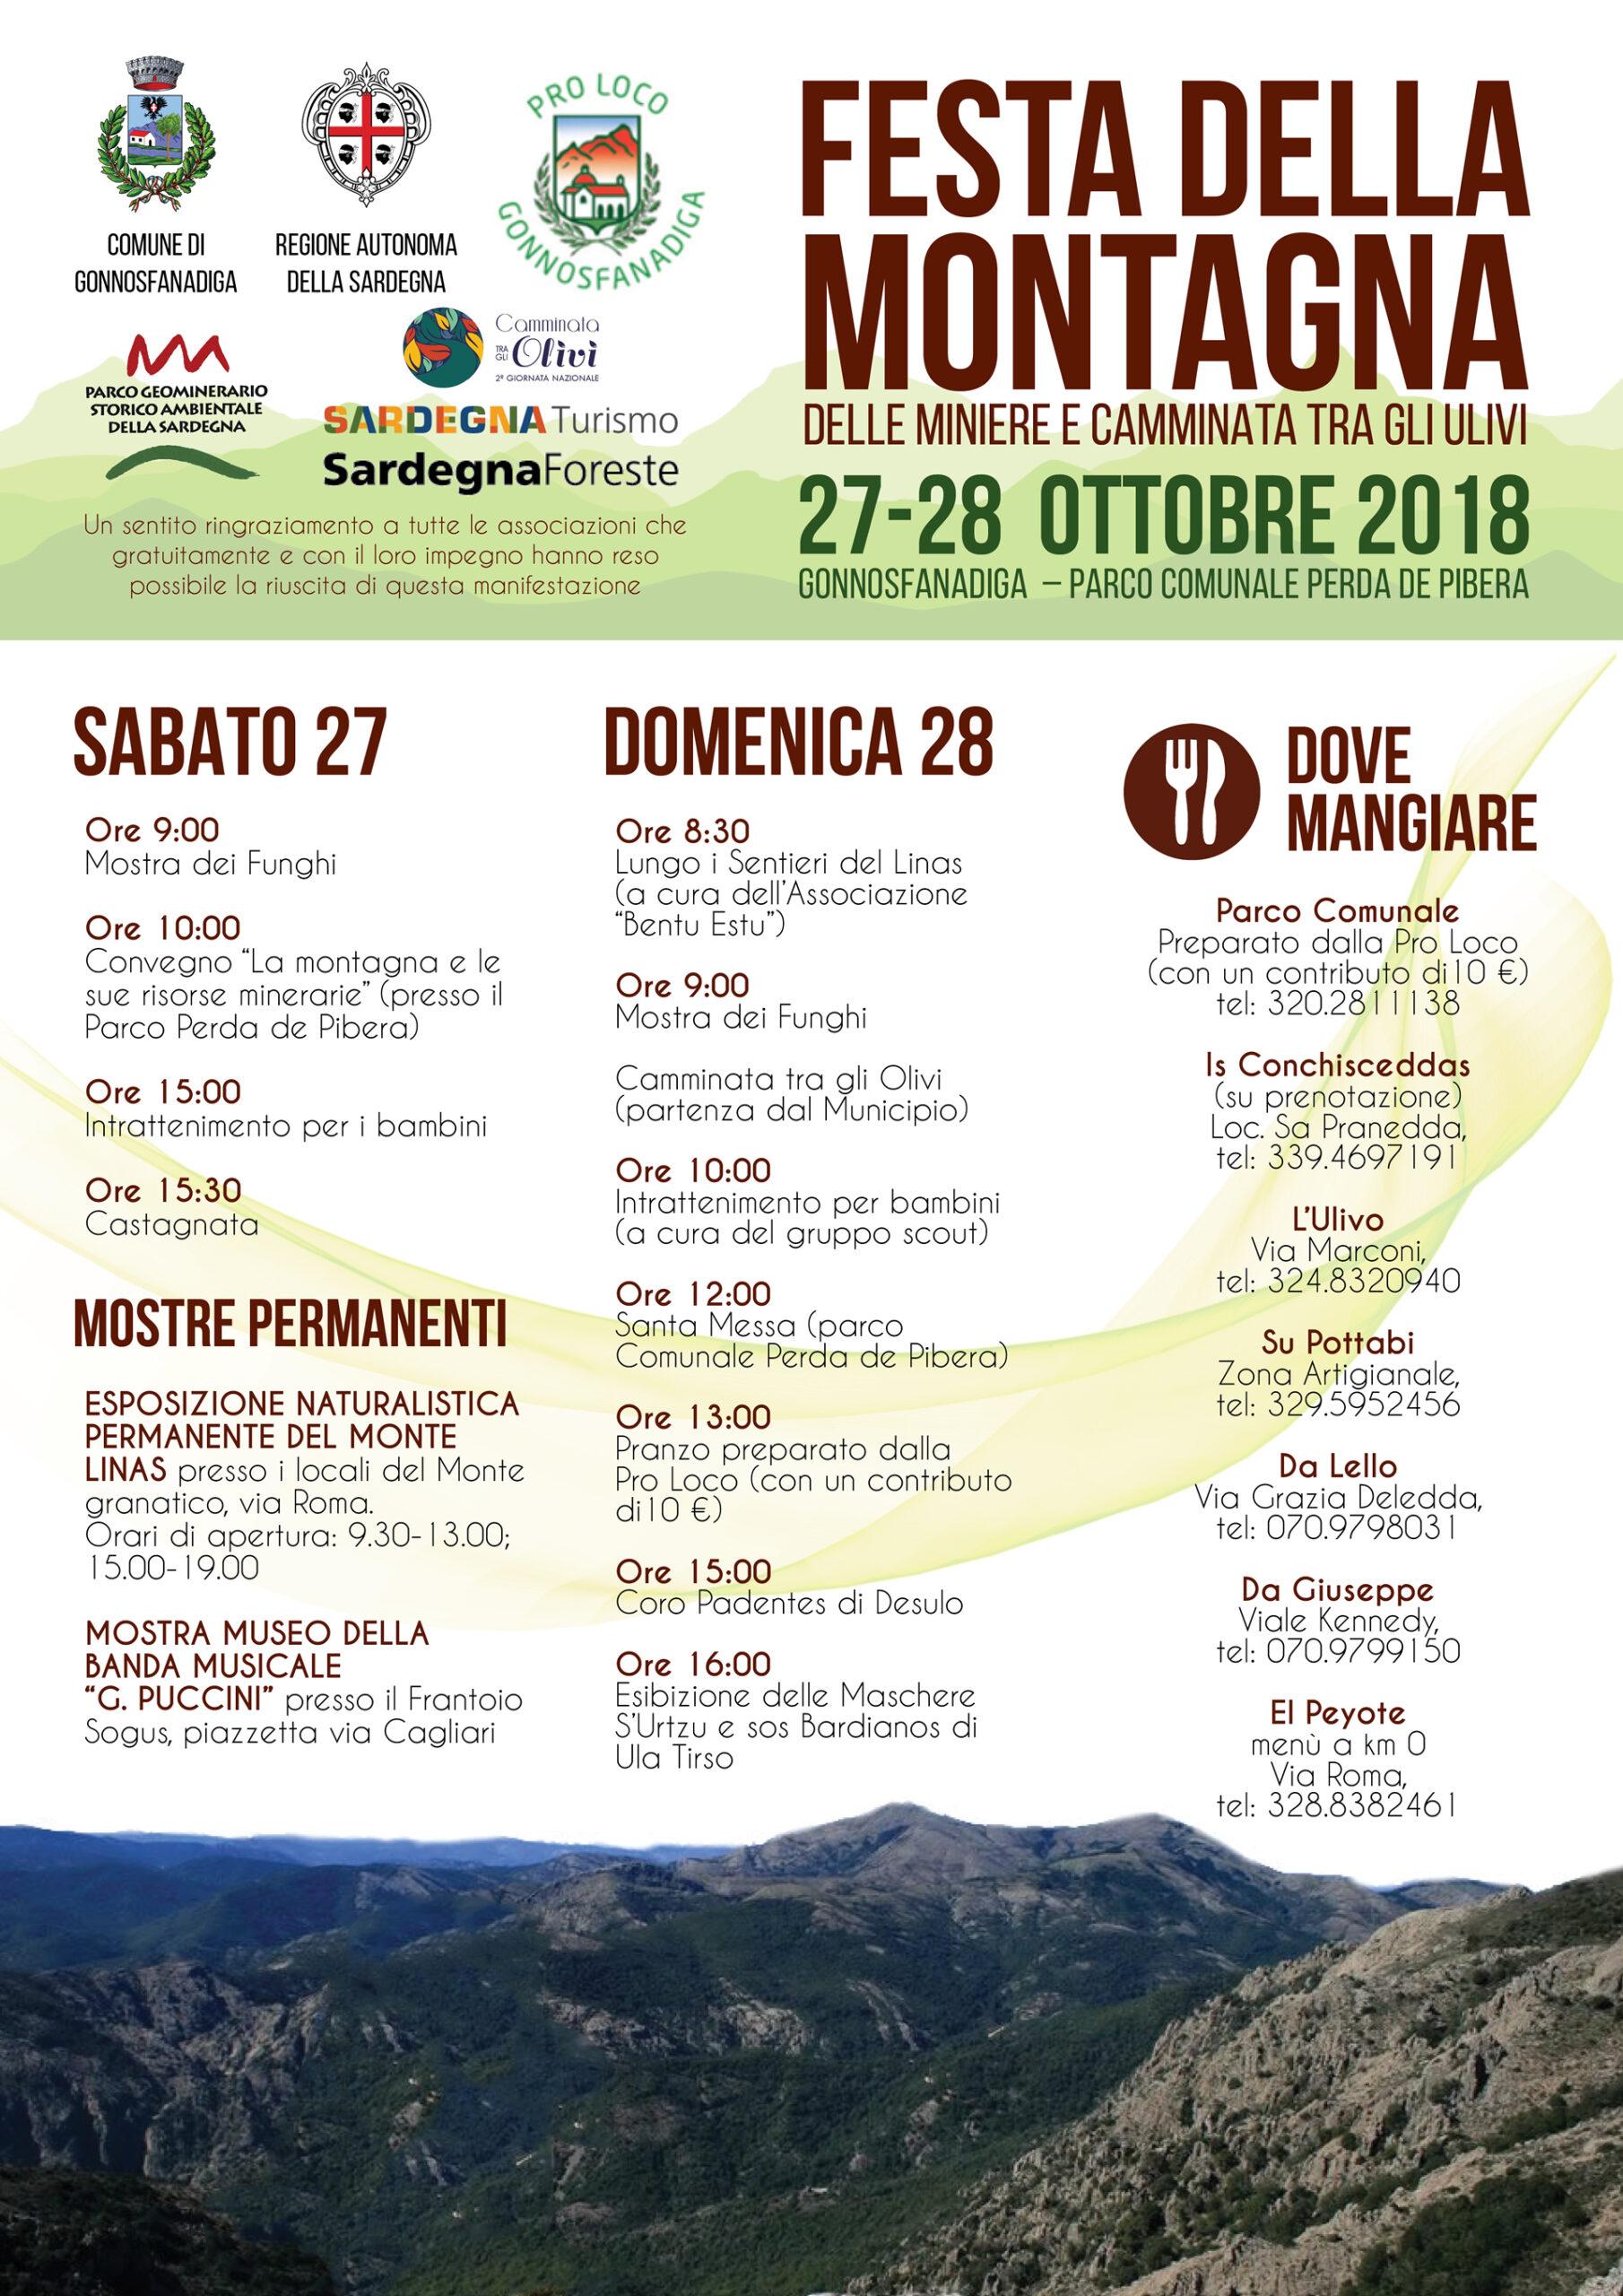 Festa della Montagna Gonnosfanadiga